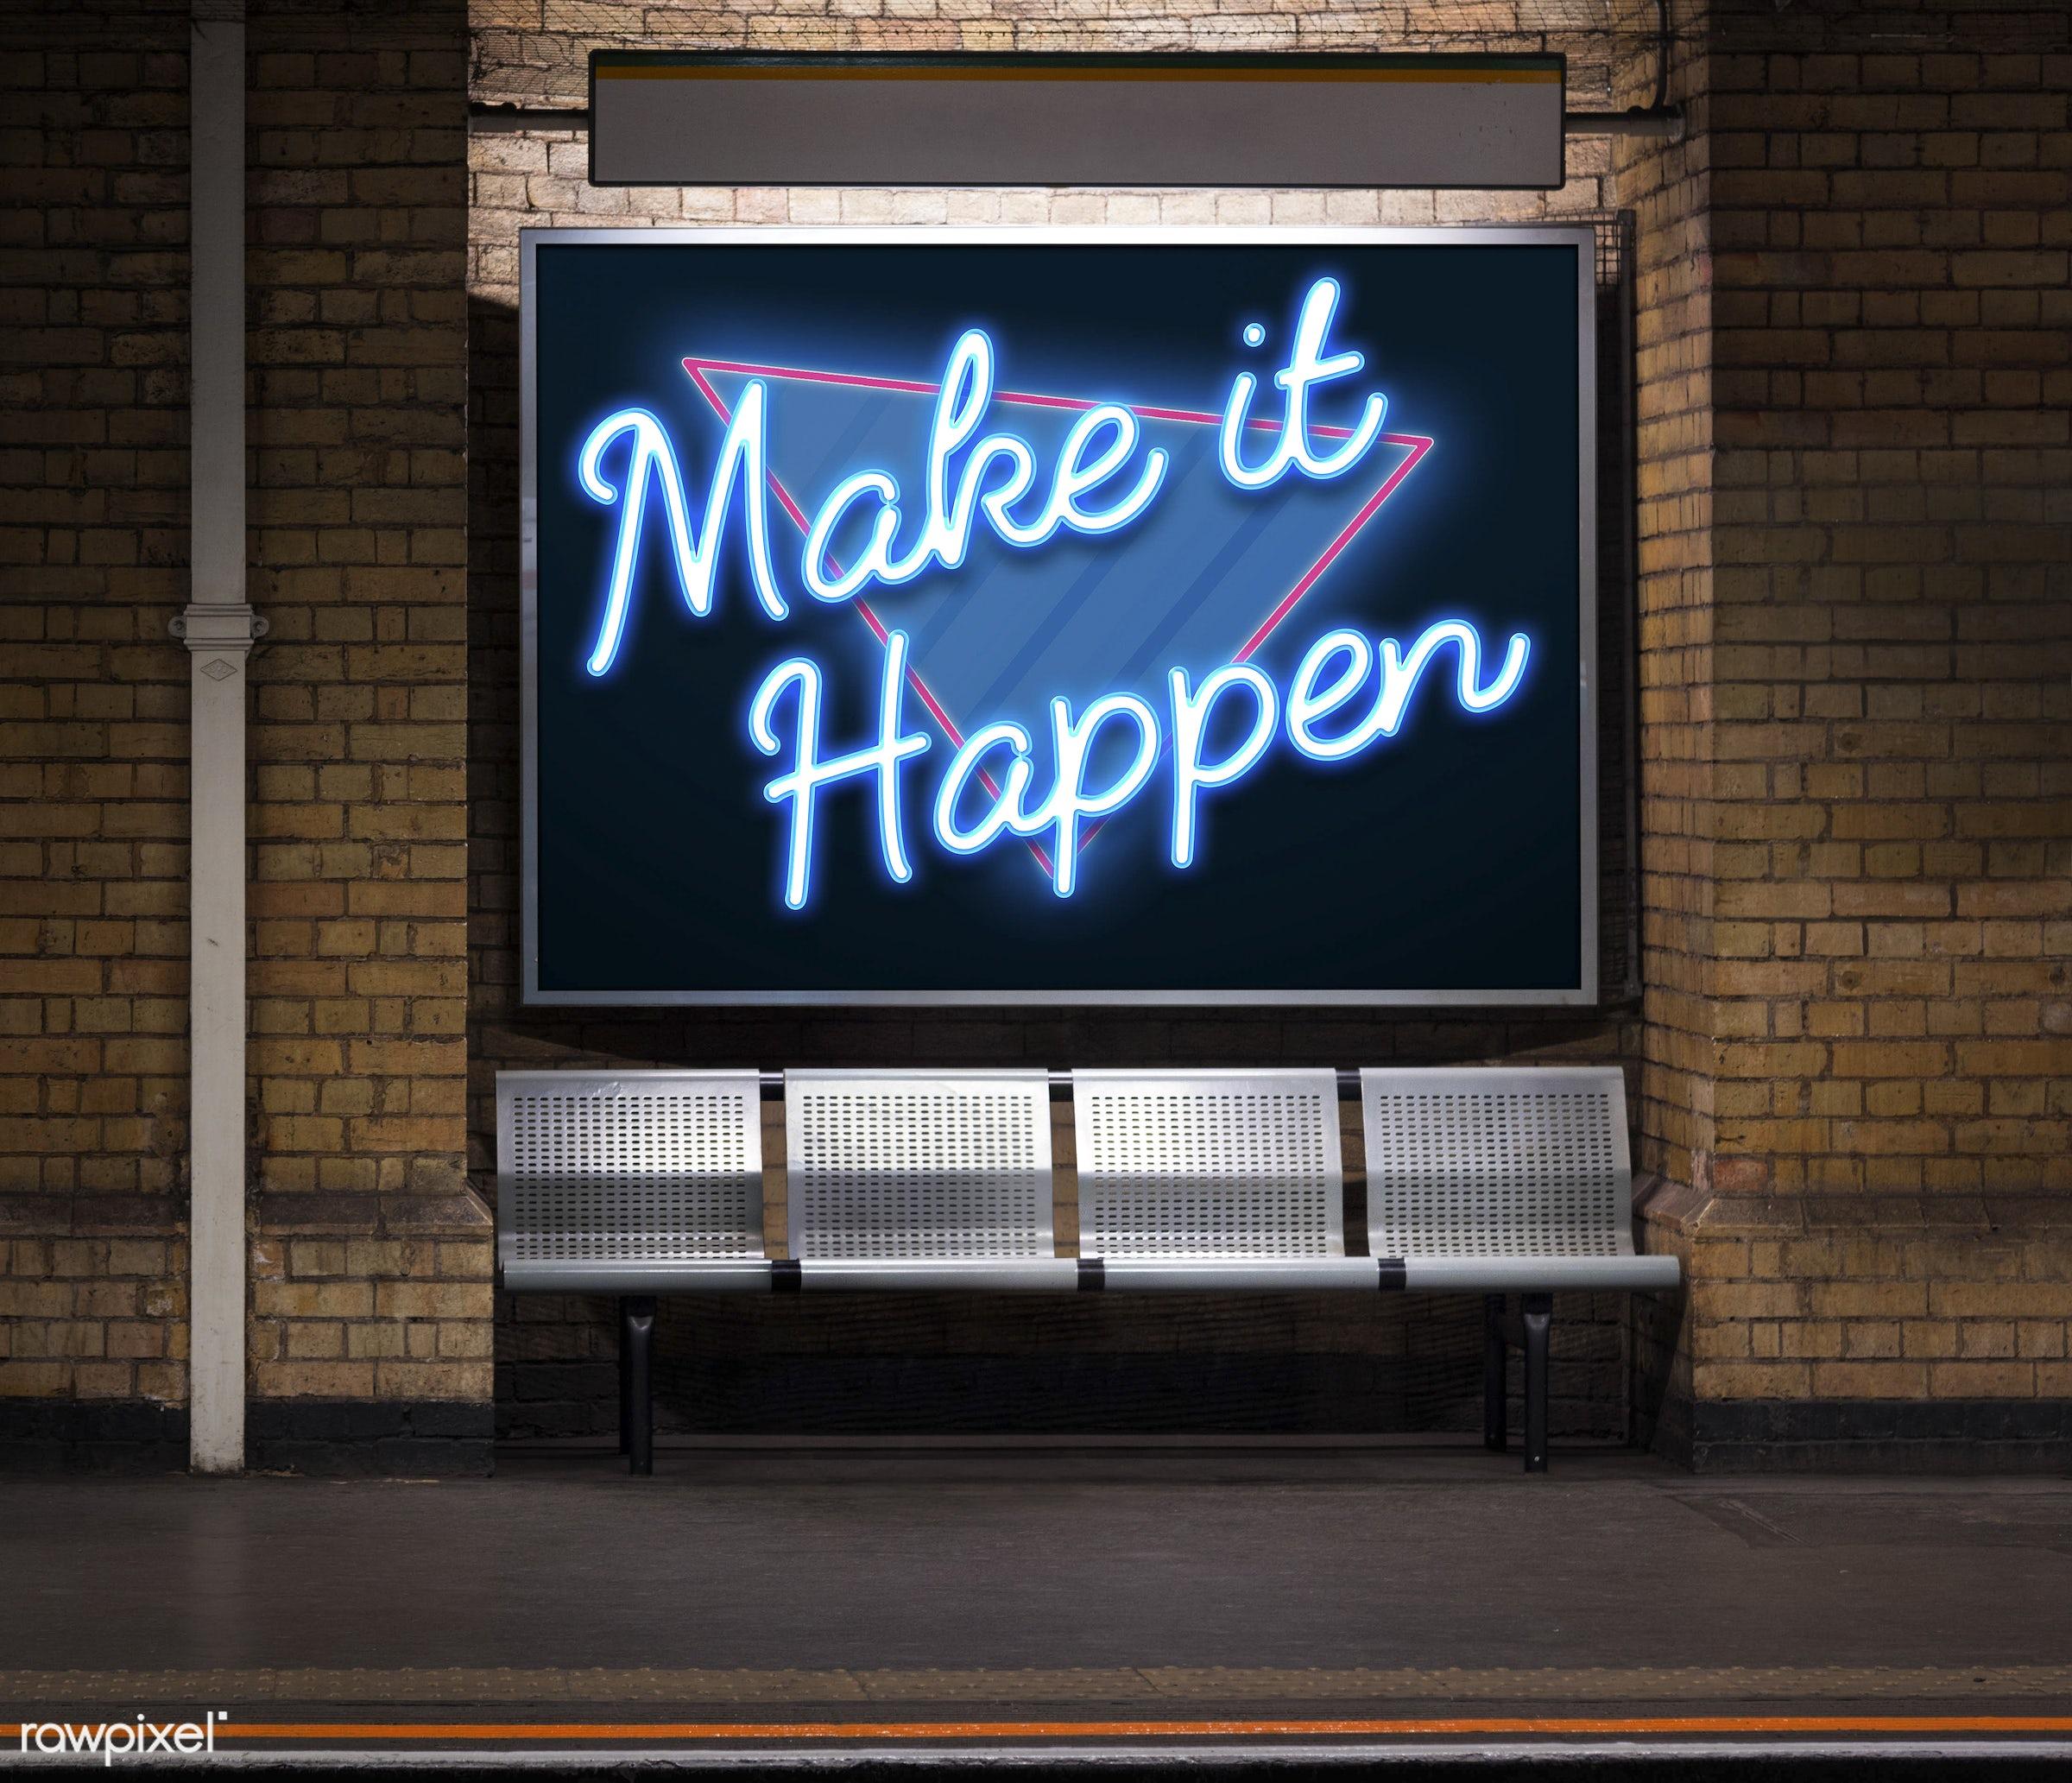 action, bricks, brickswall, change, choice, decision, effect, expression, graphic, handwriting, ideas, impact, make it...